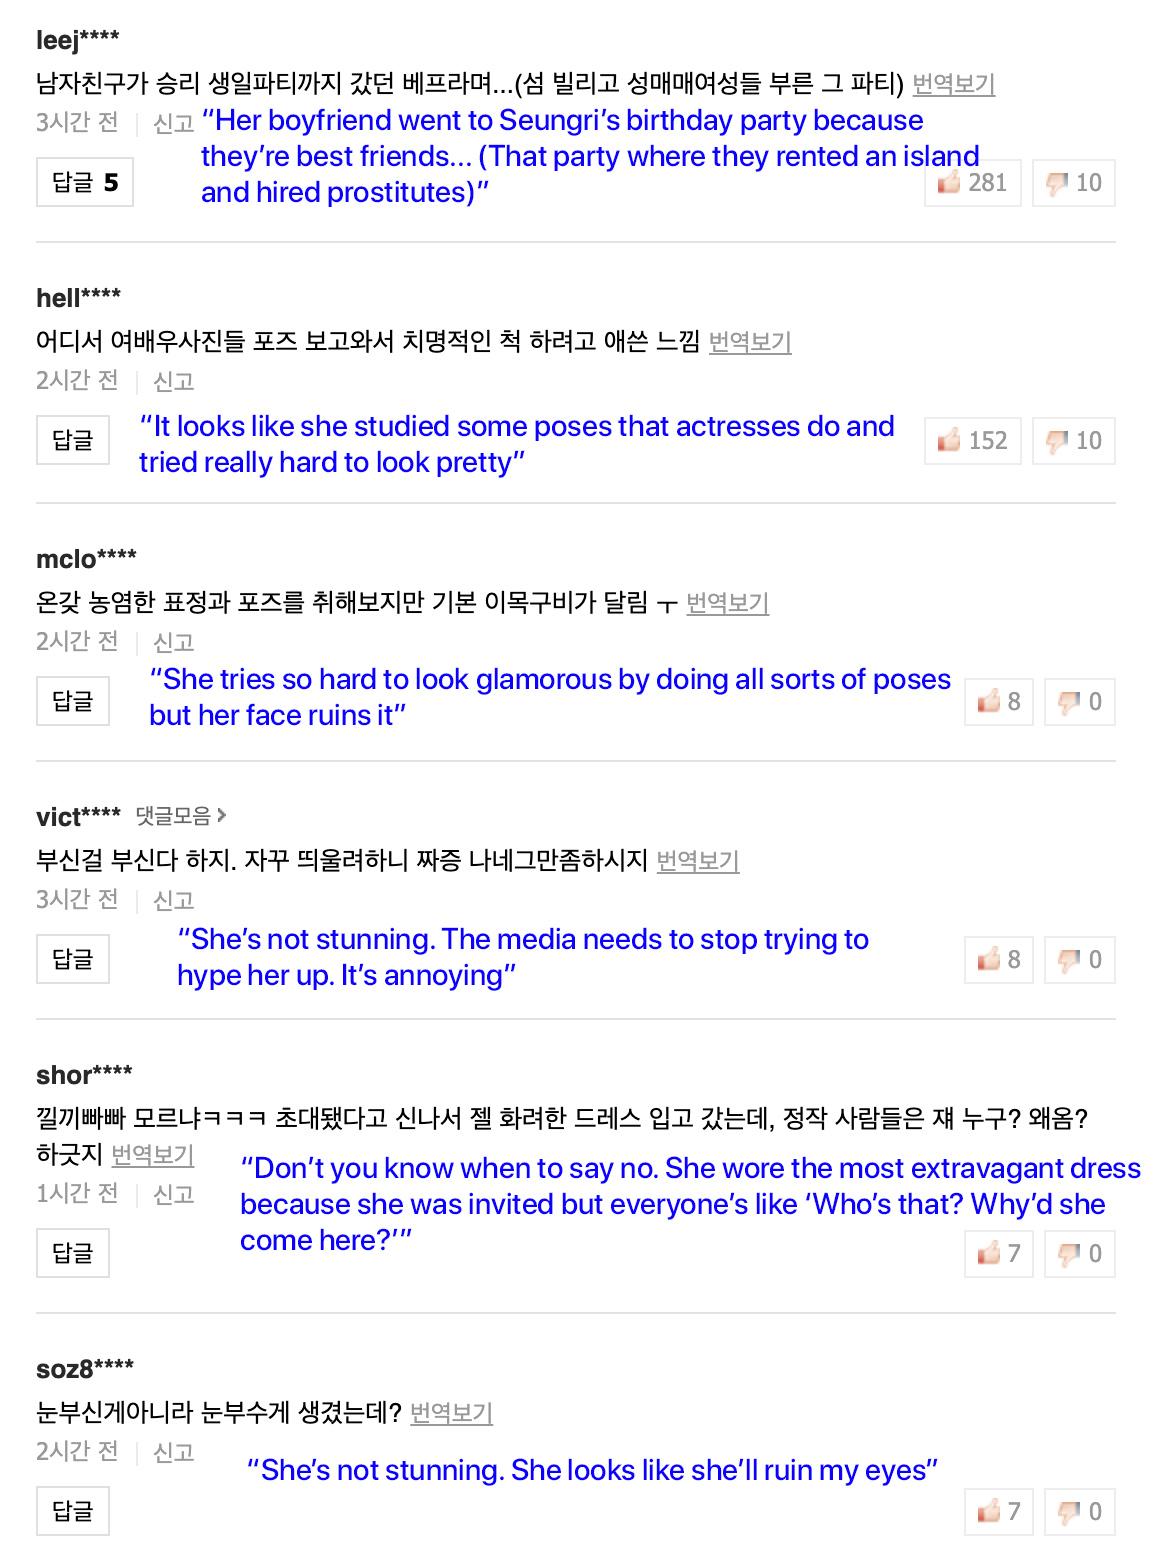 jessica jung cannes 2019 netizens